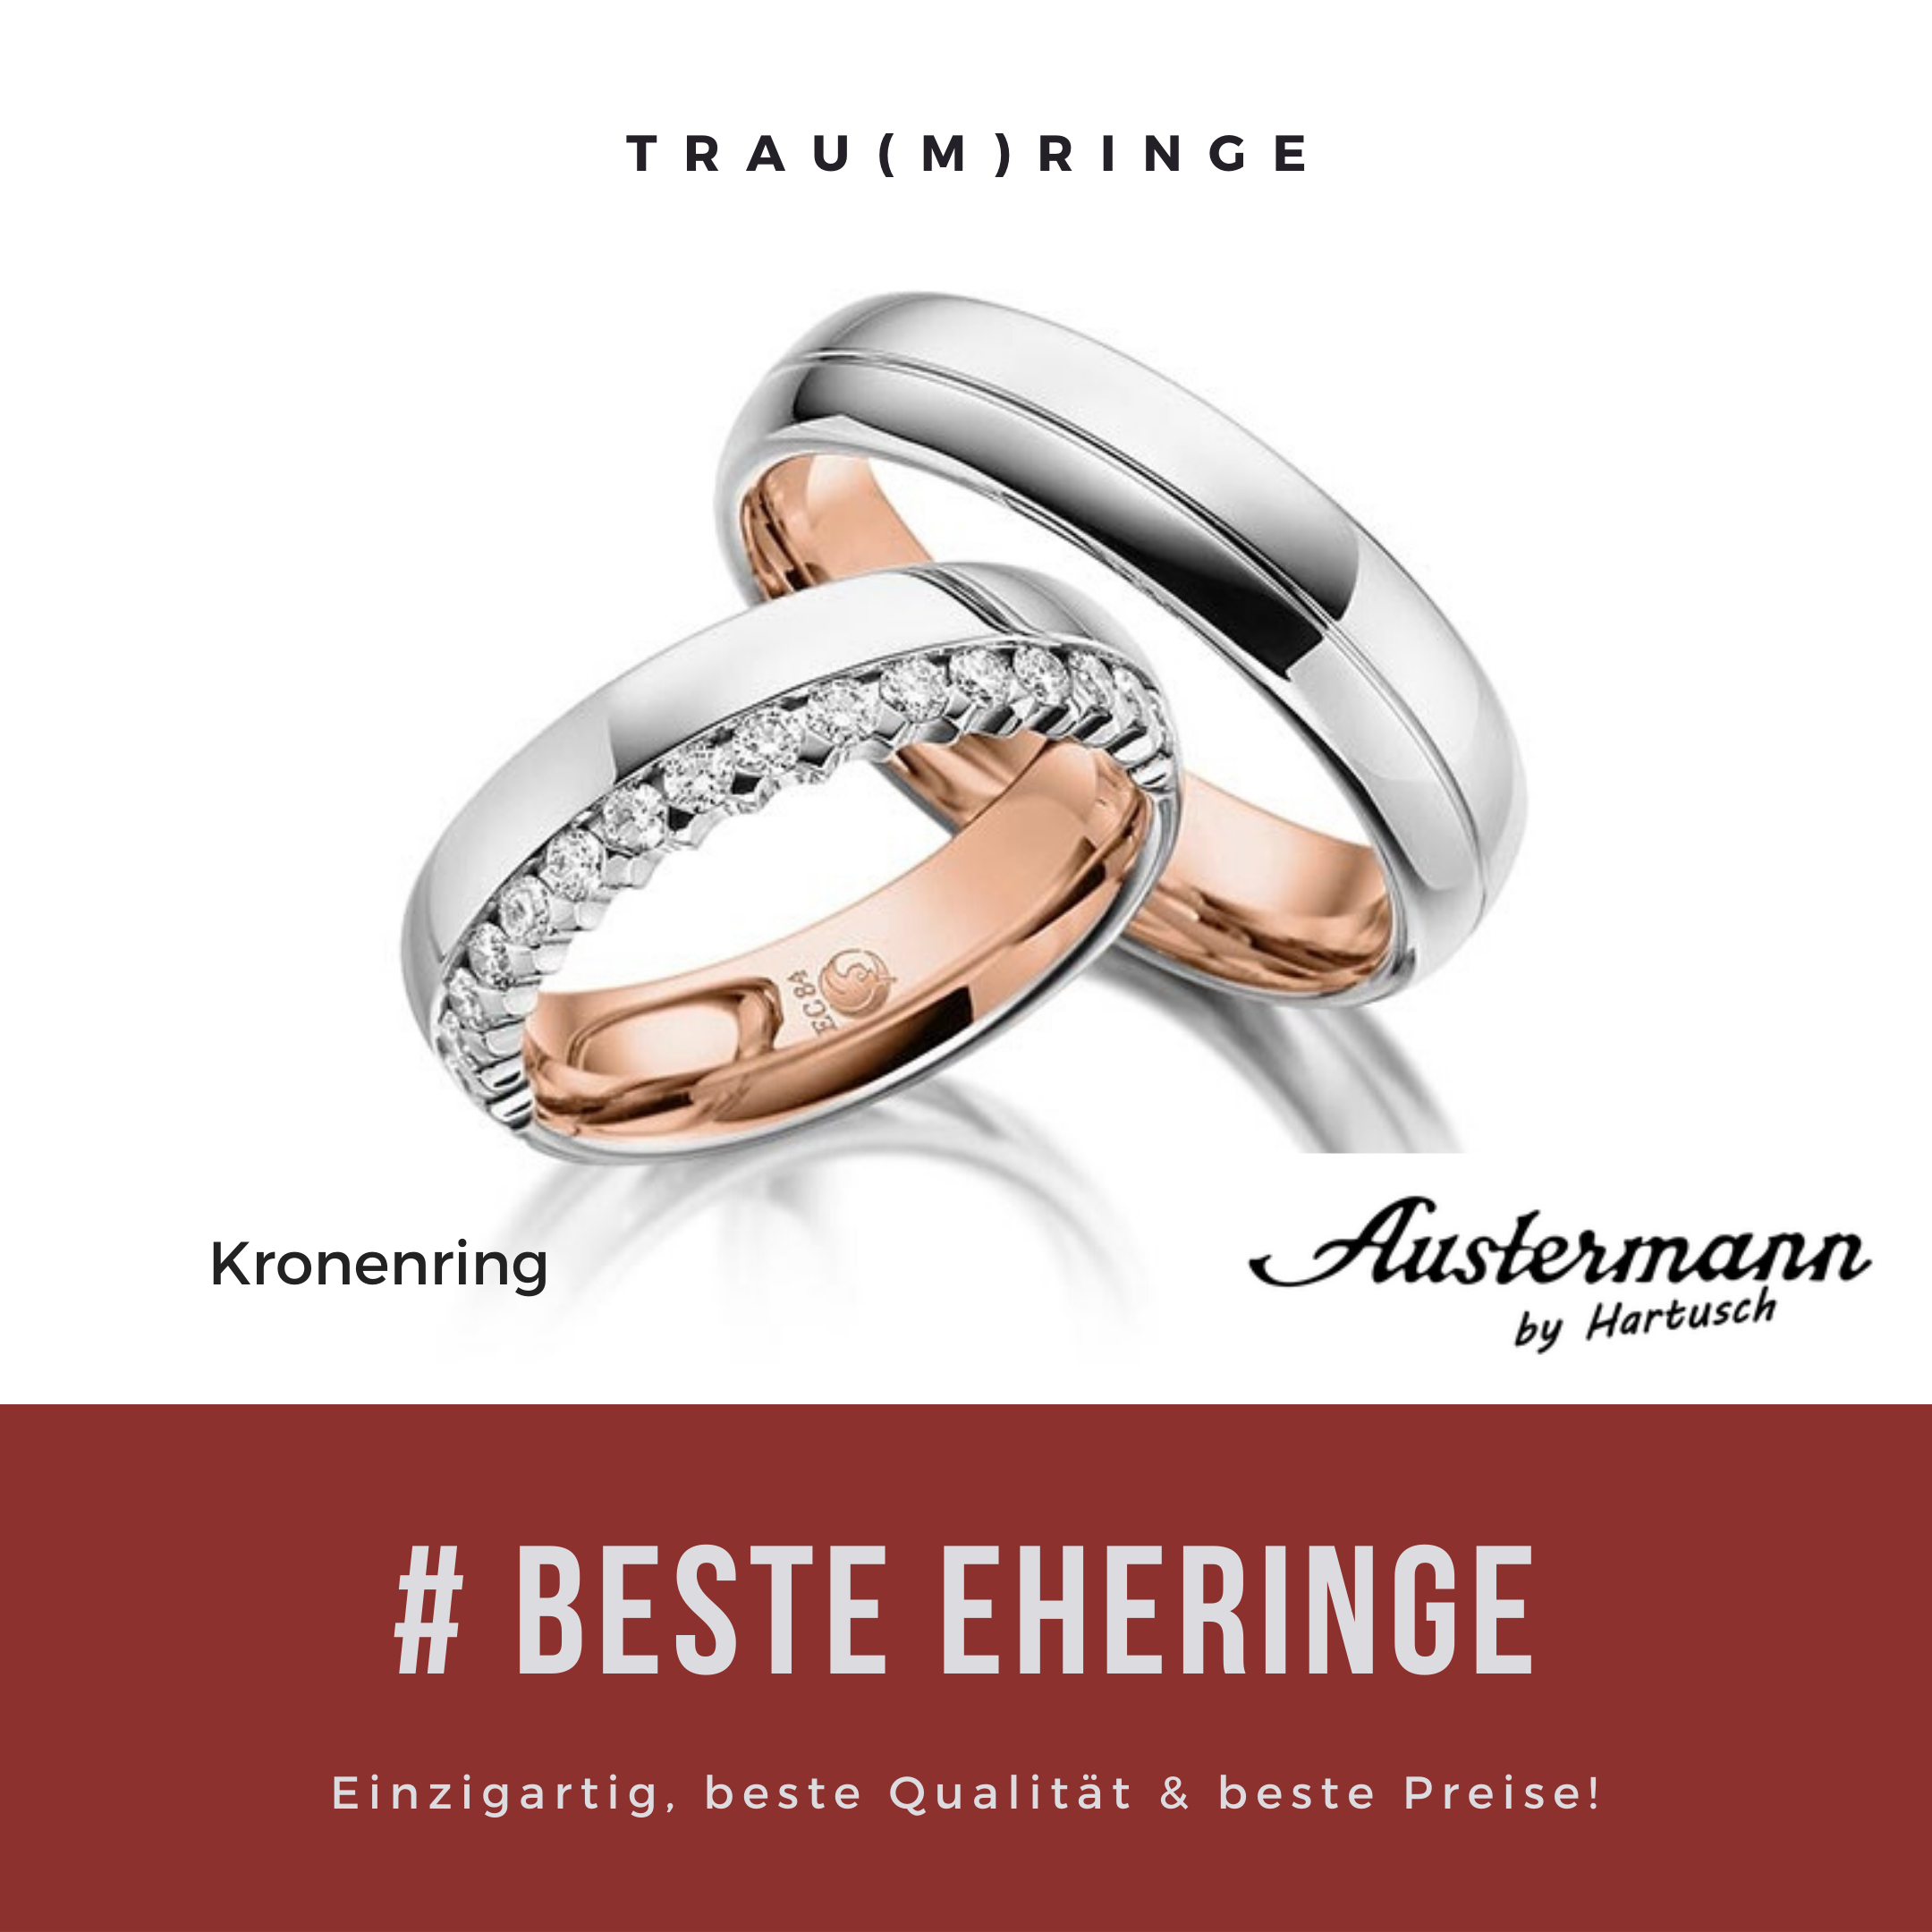 Inspirationen - Juwelier Austermann